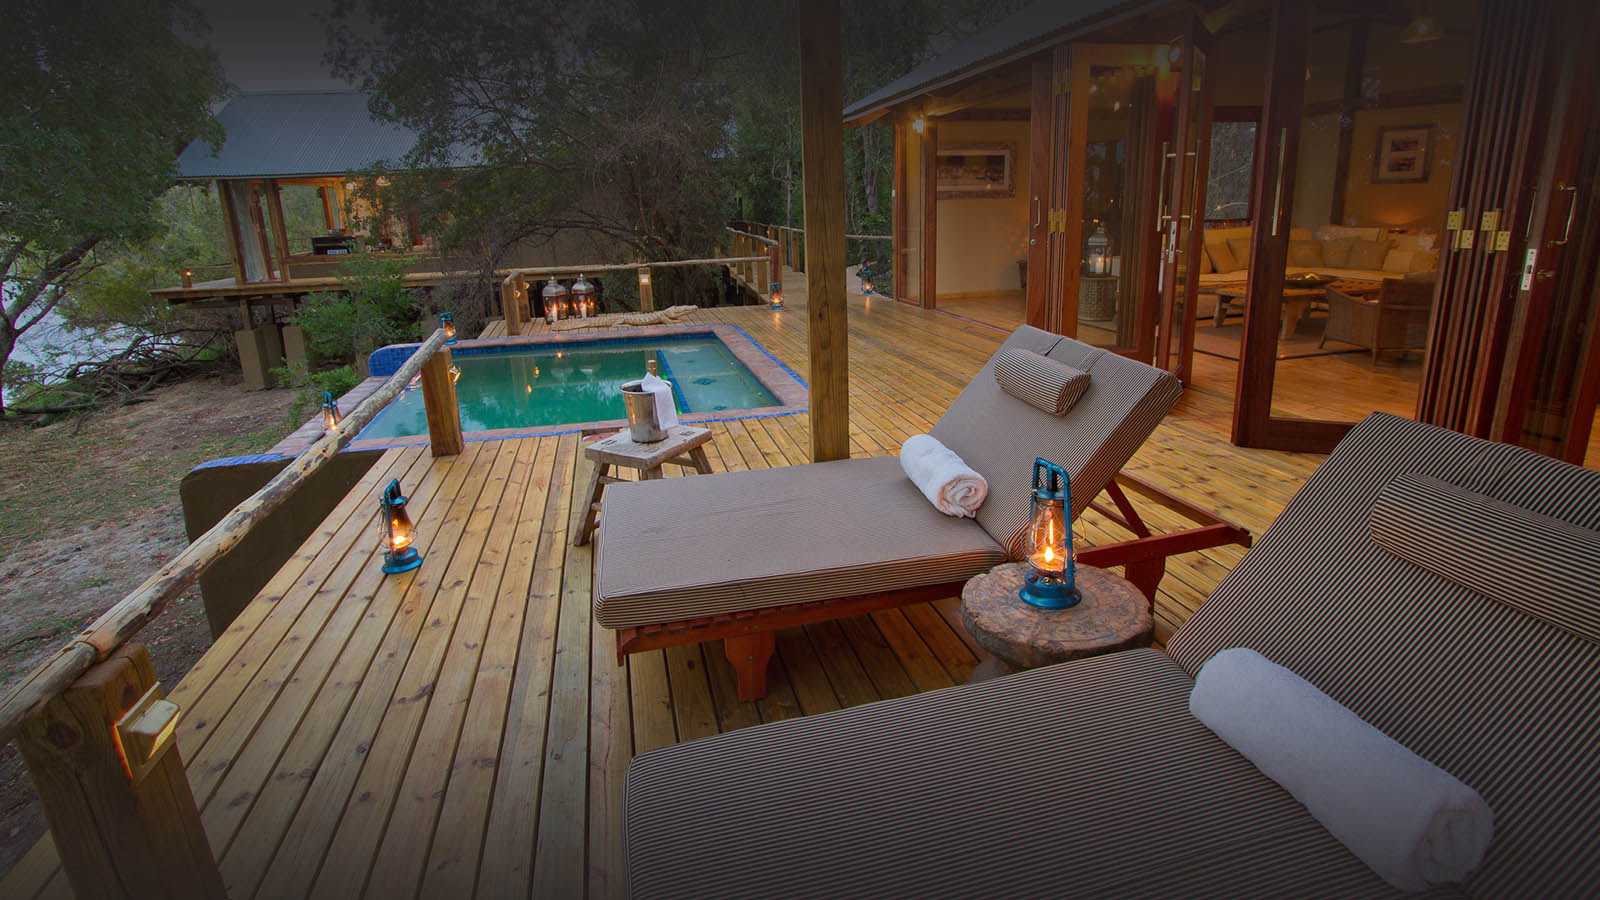 premium-family-adventure-zambia-in-style-safari-packages-tours-luxury-tongabezi-dog-house